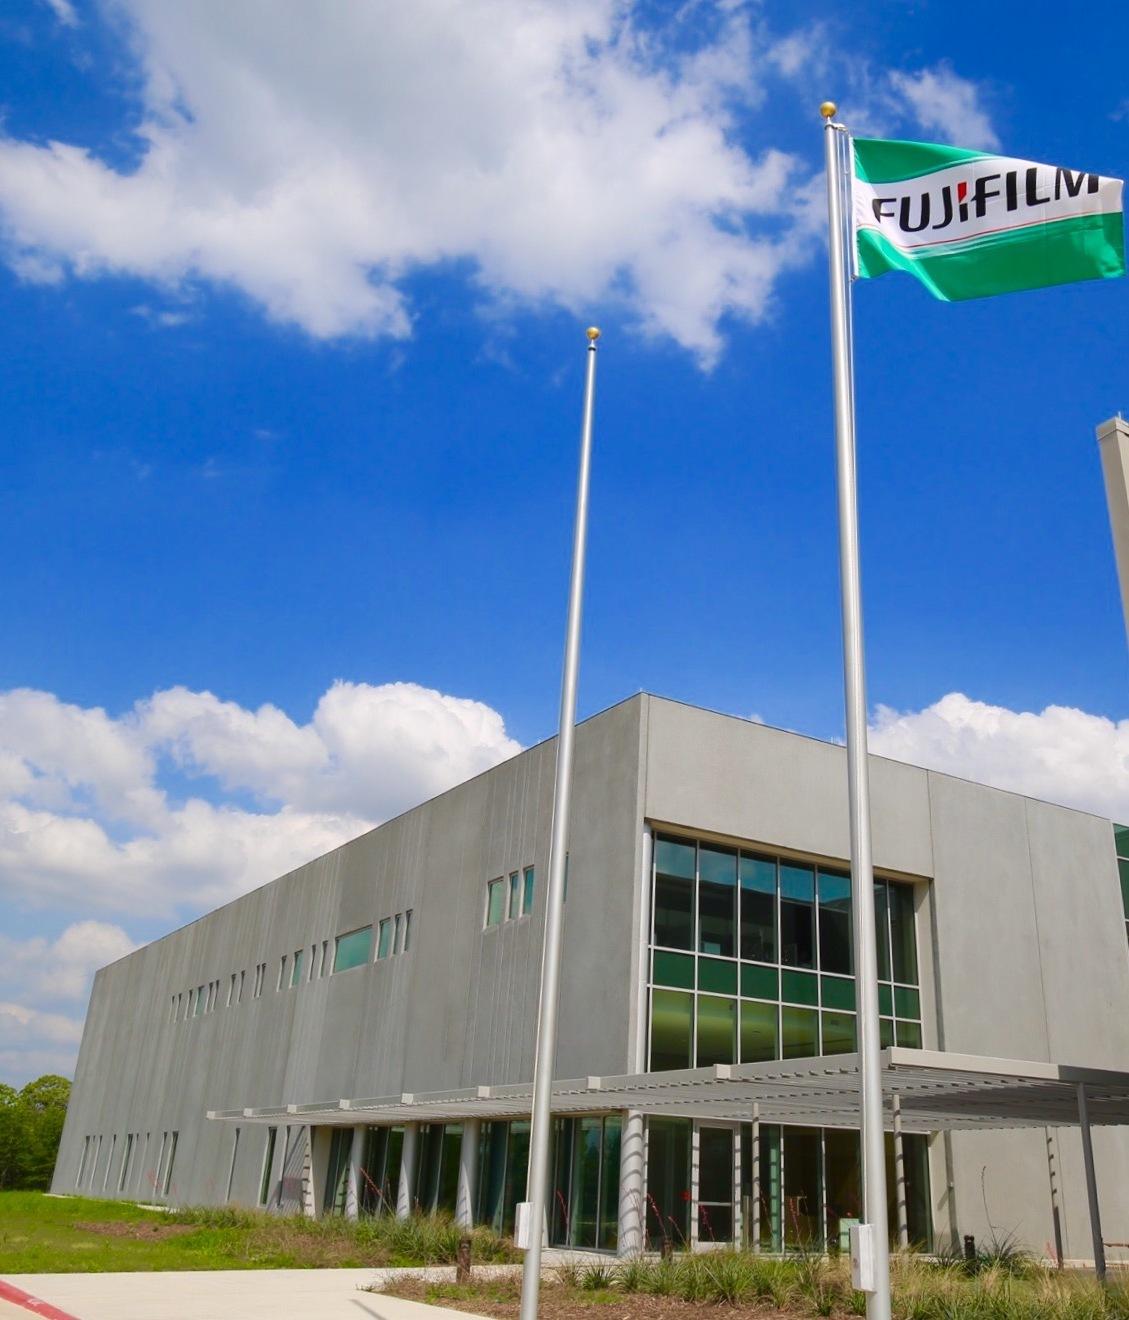 FUJIFILM Corporation Corporate Communications Division Kana Matsumoto TEL 81 3 6271 2000 Or Other Bio CDMO